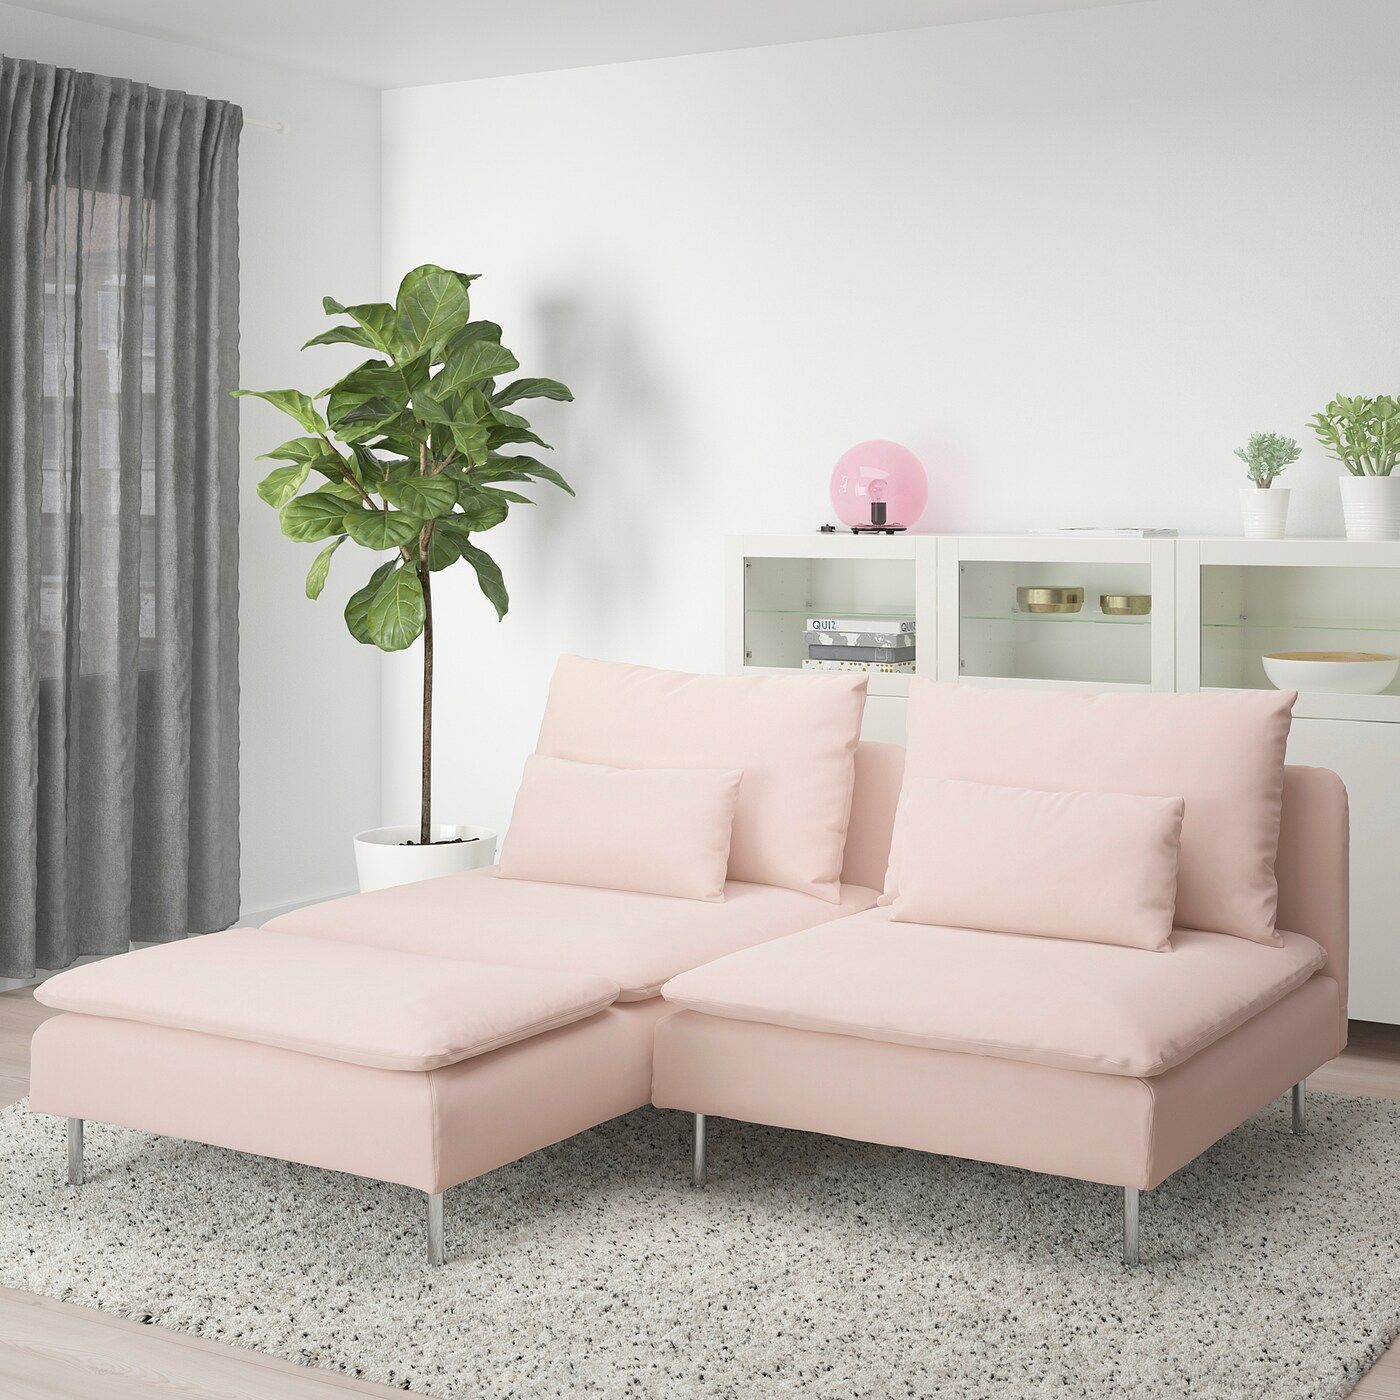 Soderhamn Loveseat With Chaise Samsta Light Pink Canape Sans Accoudoir Causeuse Ikea